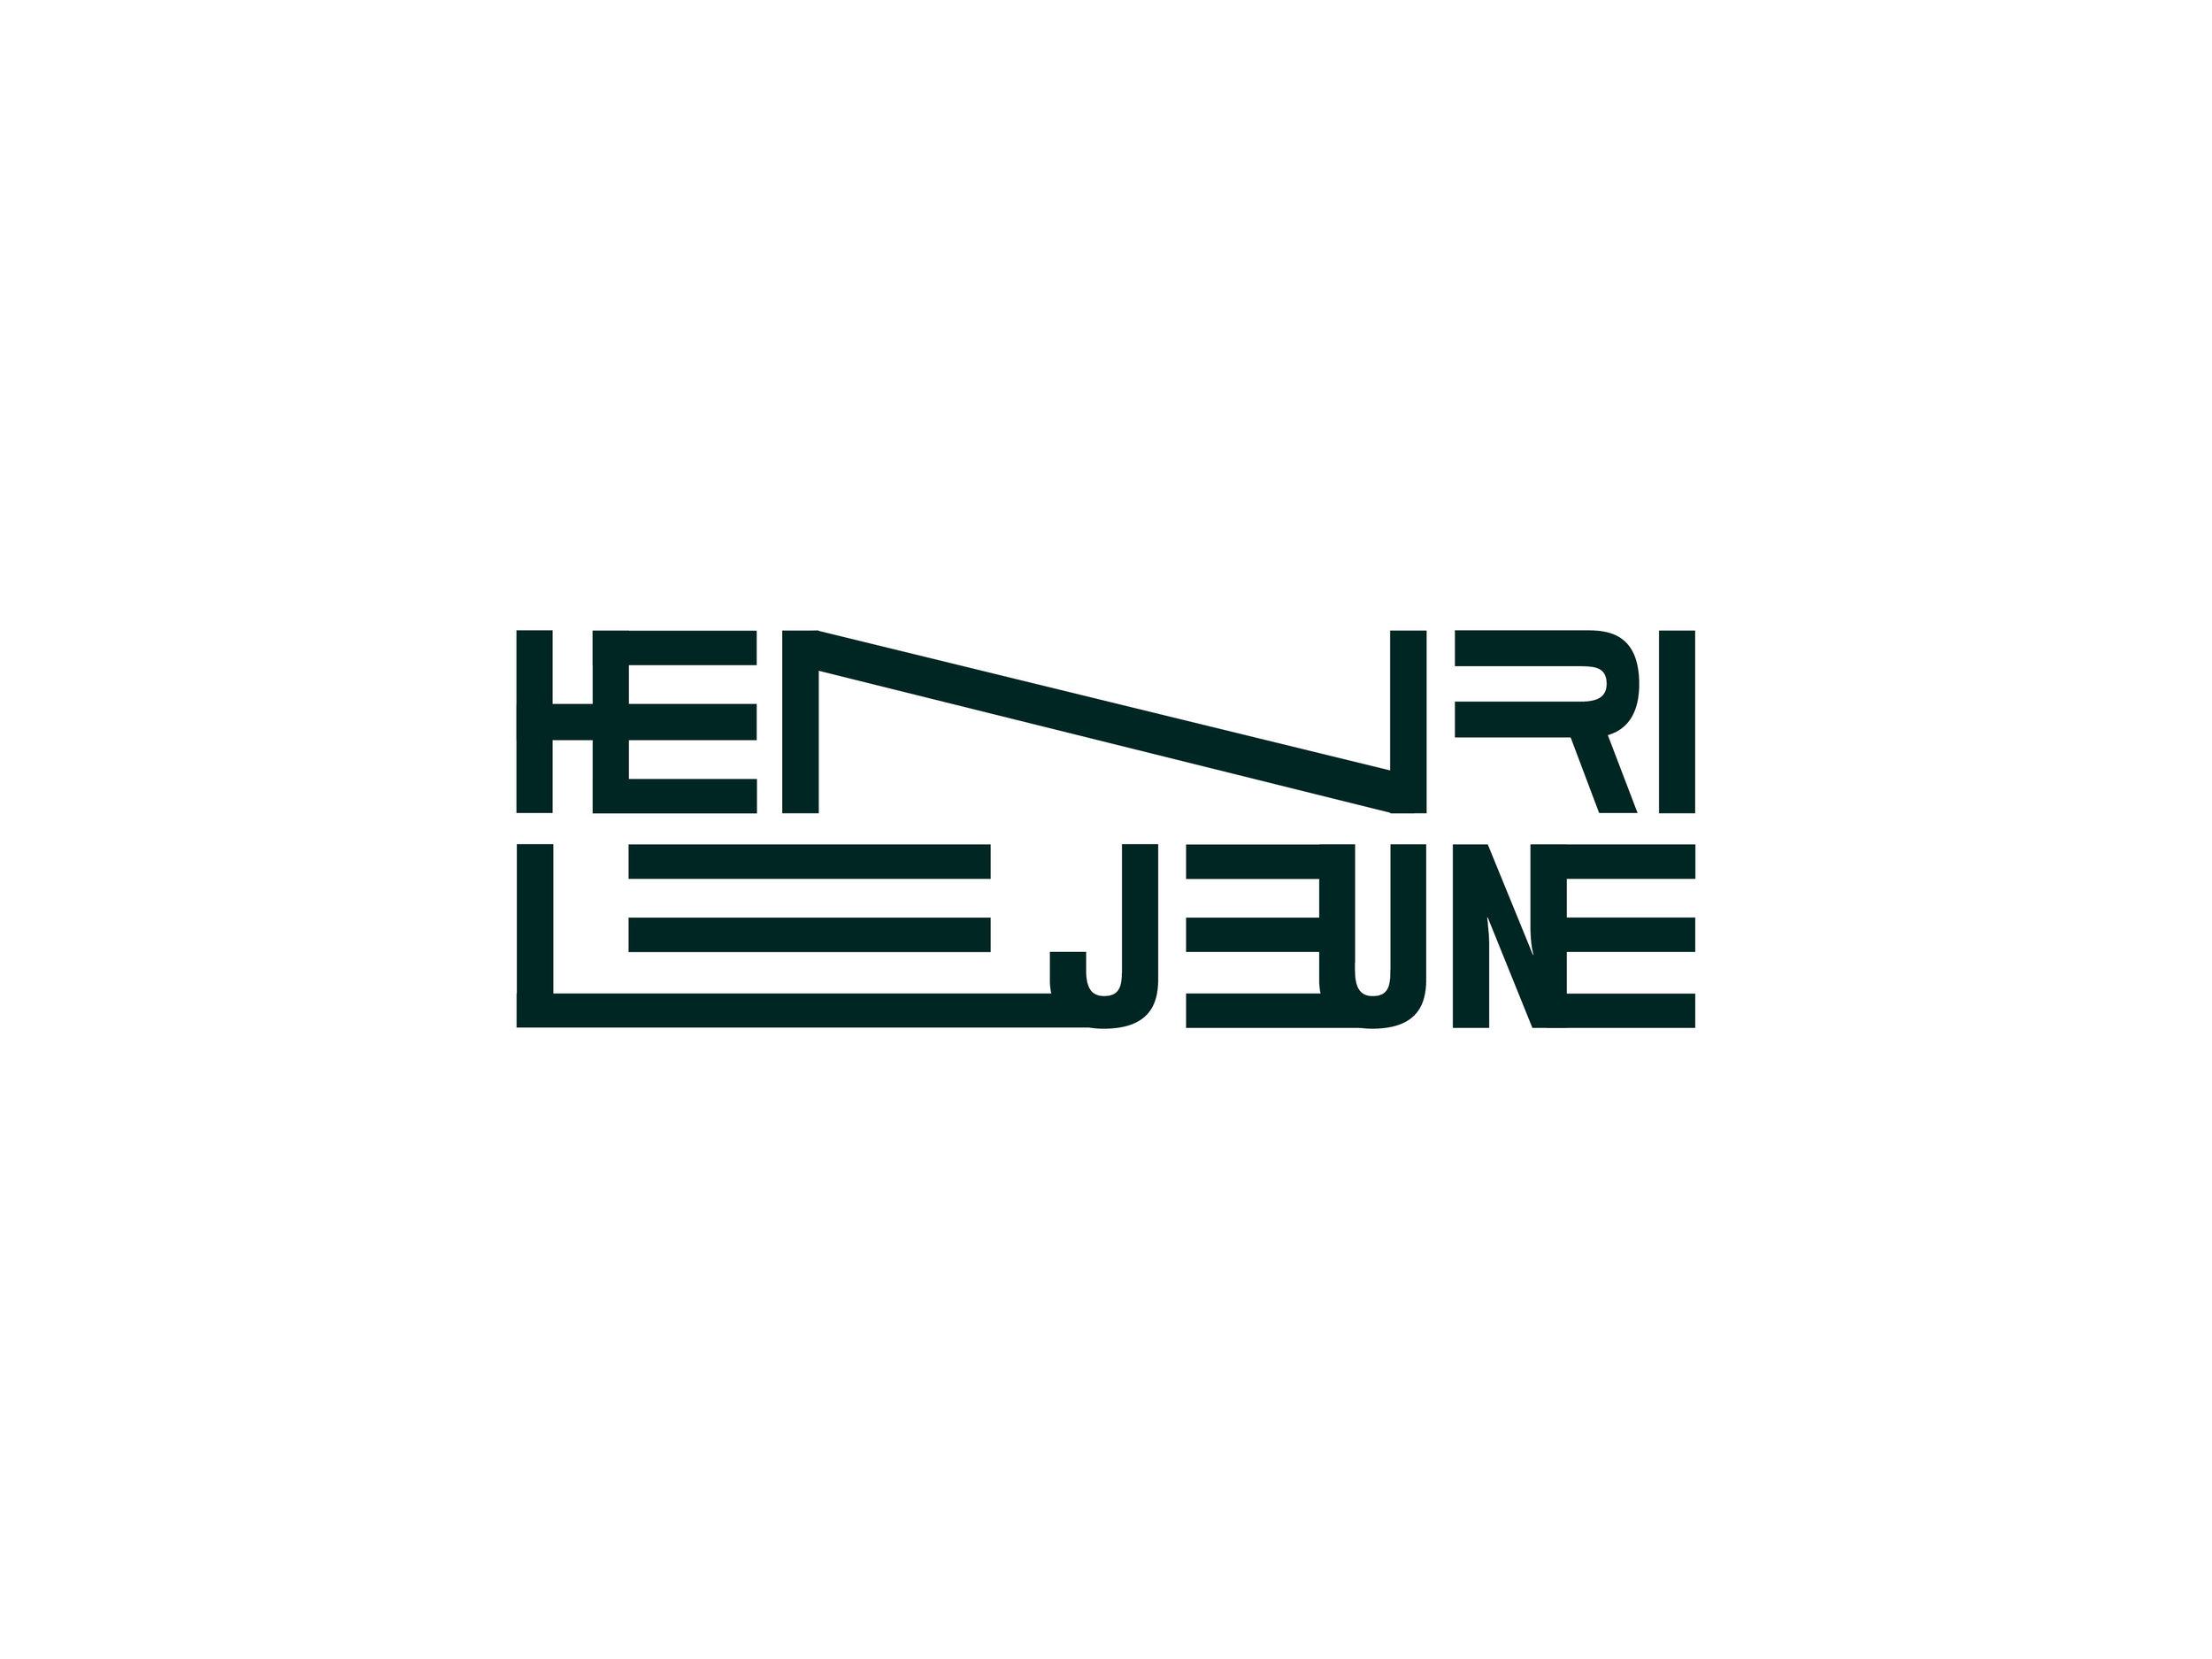 Henri Lejeune Branding Research